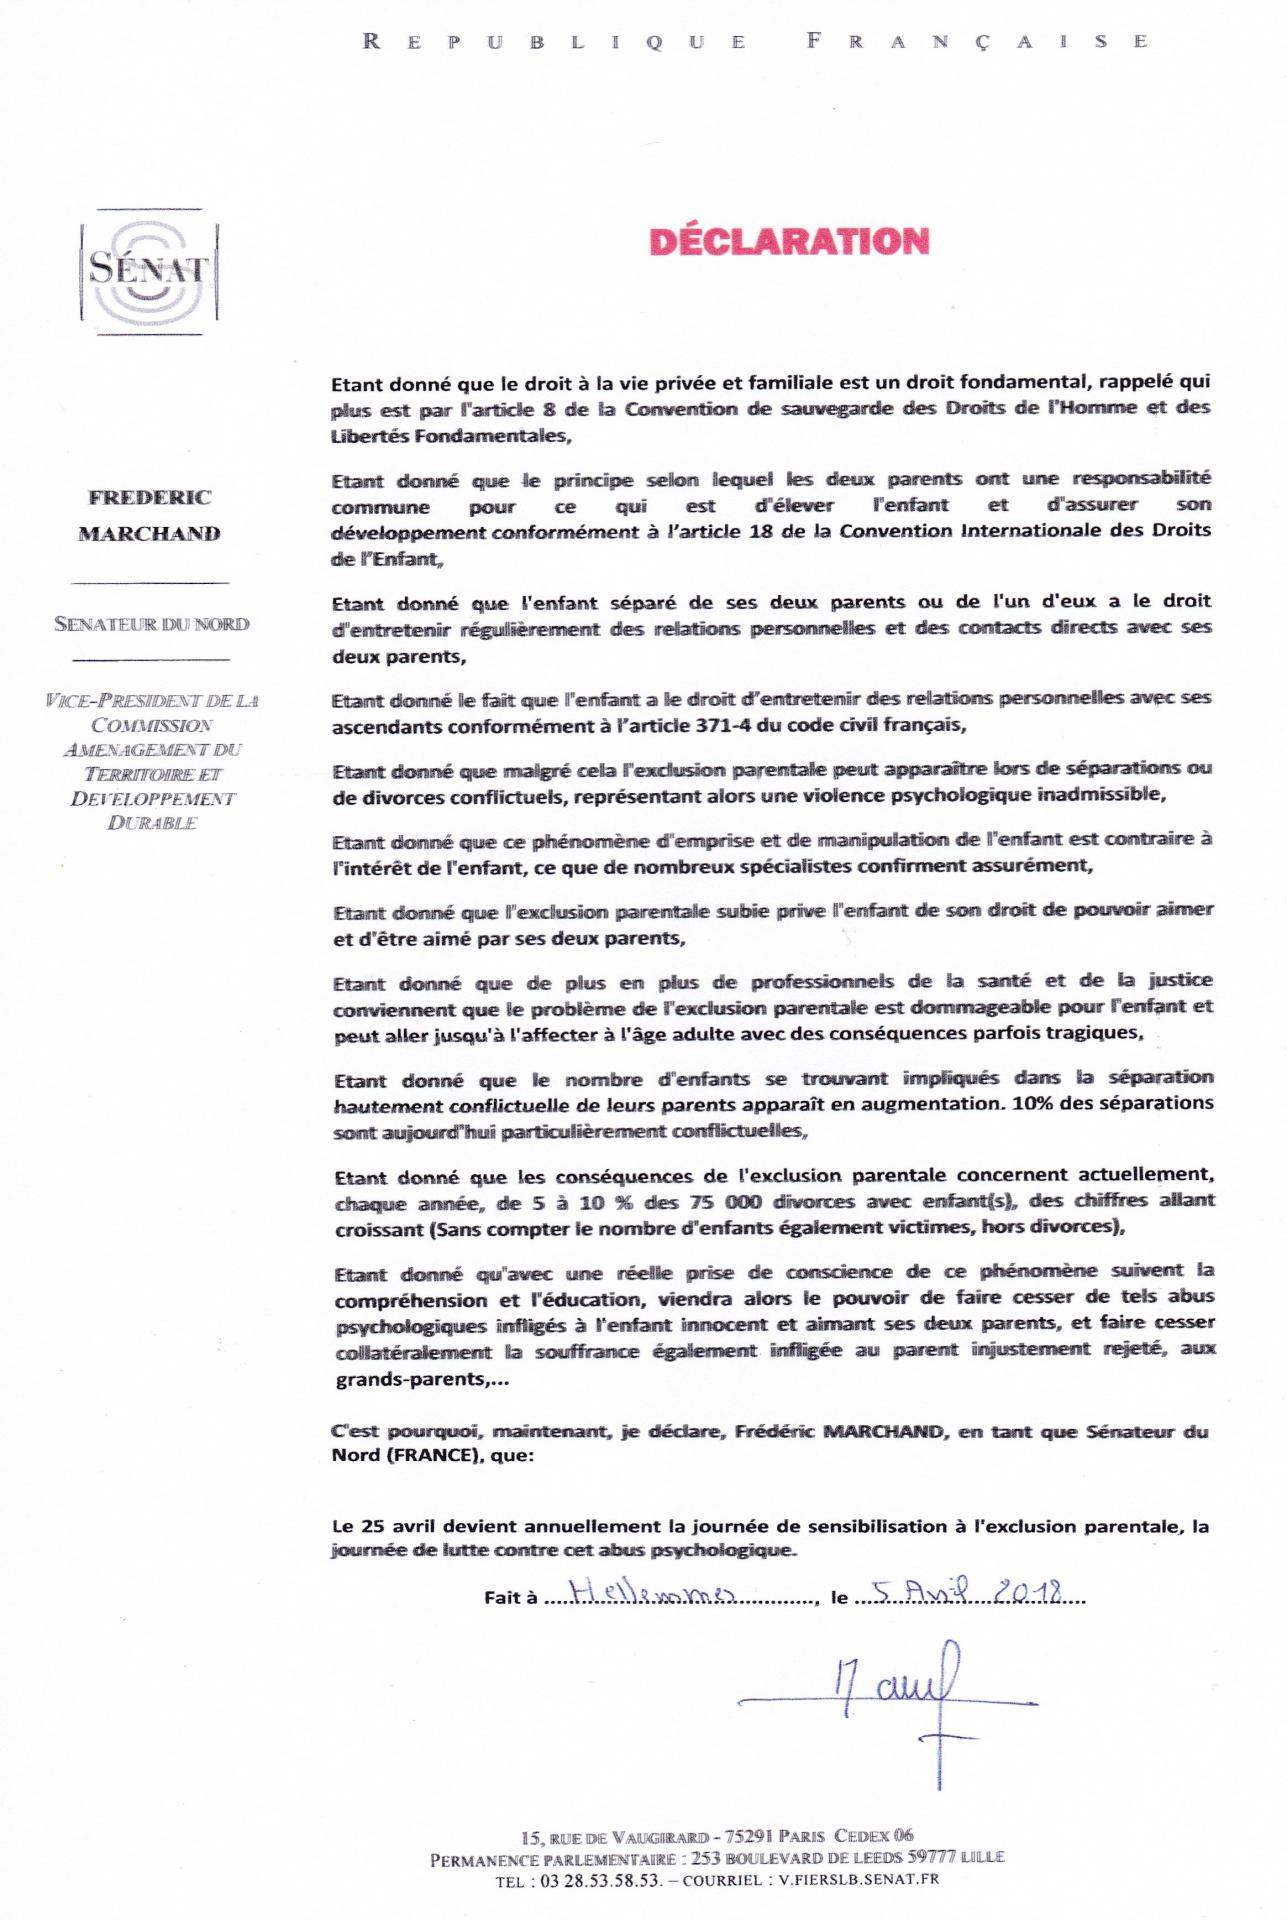 Declaration f marchand larem